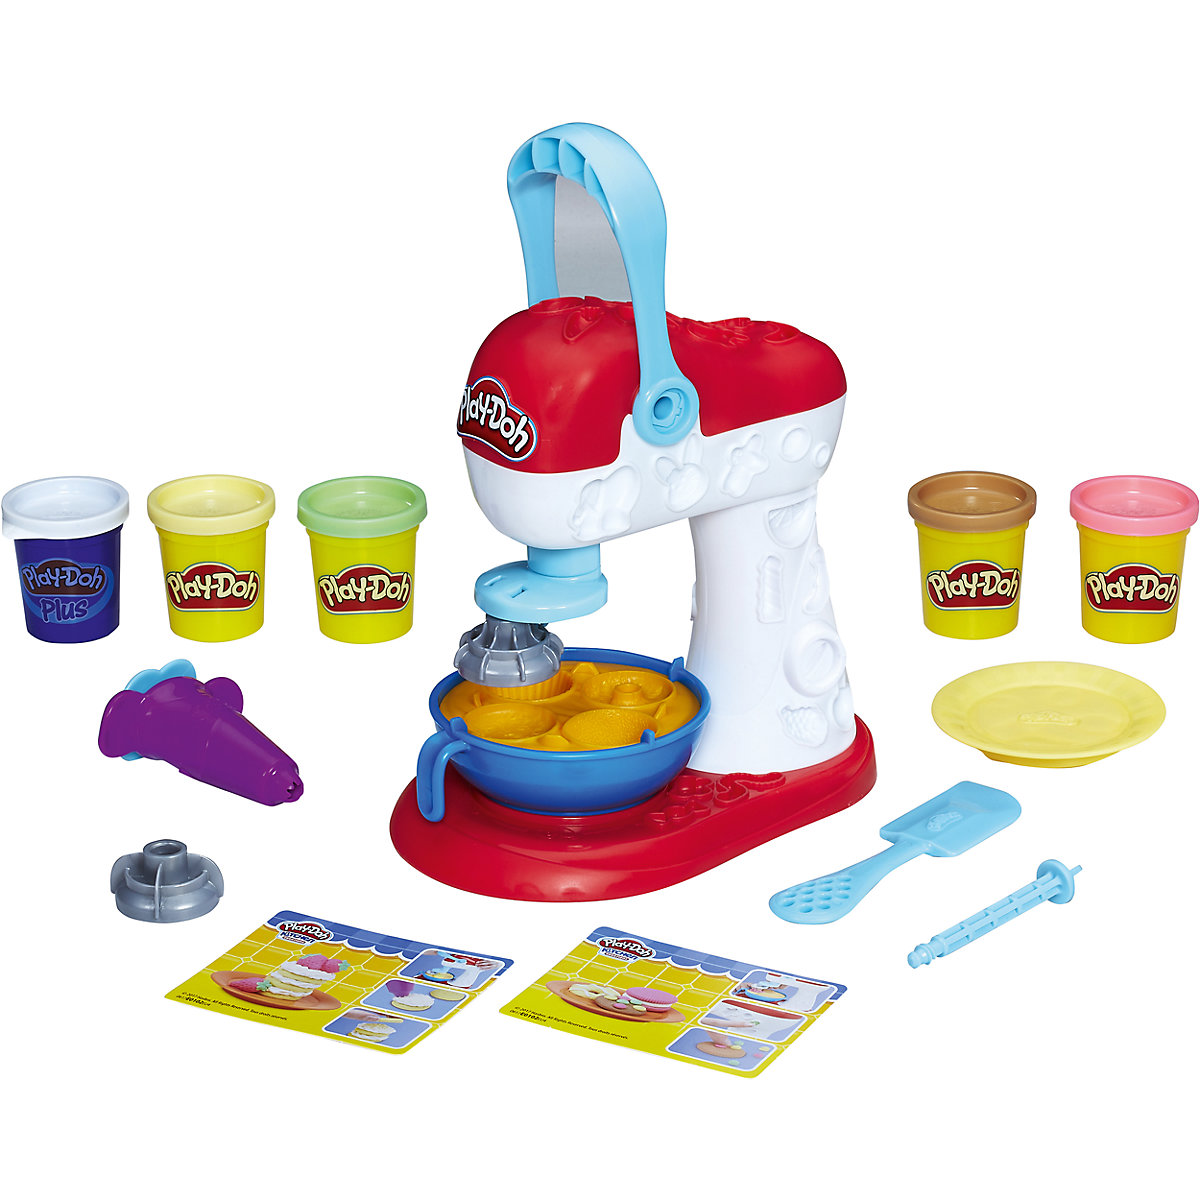 Juego-Doh modelado arcilla/Slime 7188868 goma de mascar plastilina de oficina esculpir niños niñas niño niñas niños para niños play-doh MTpromo